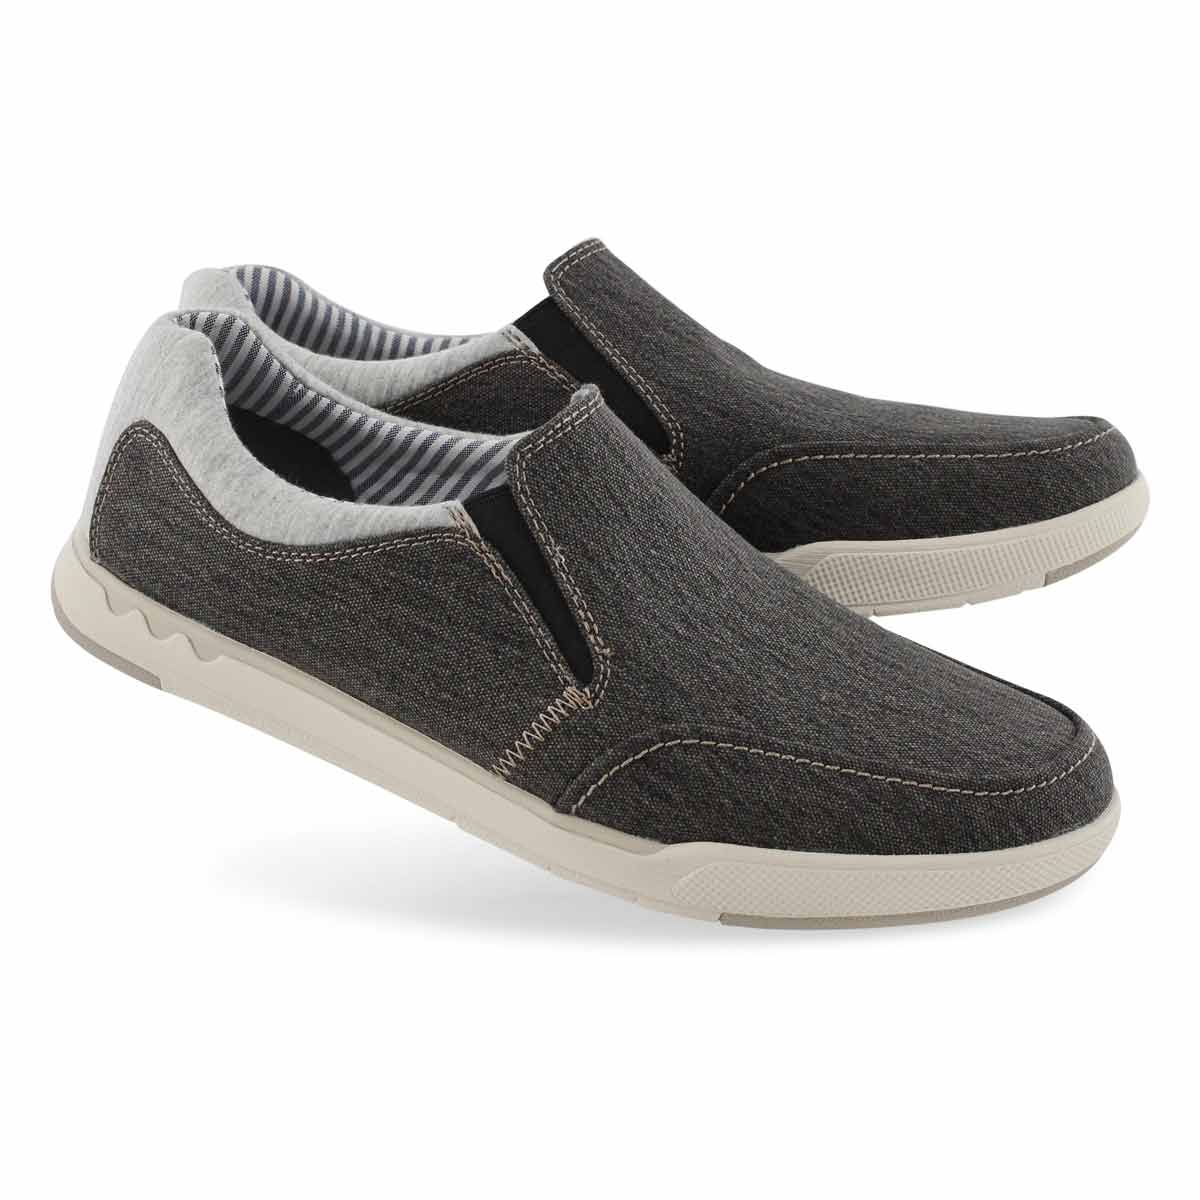 Mns Step Isle Slip blk casual shoe